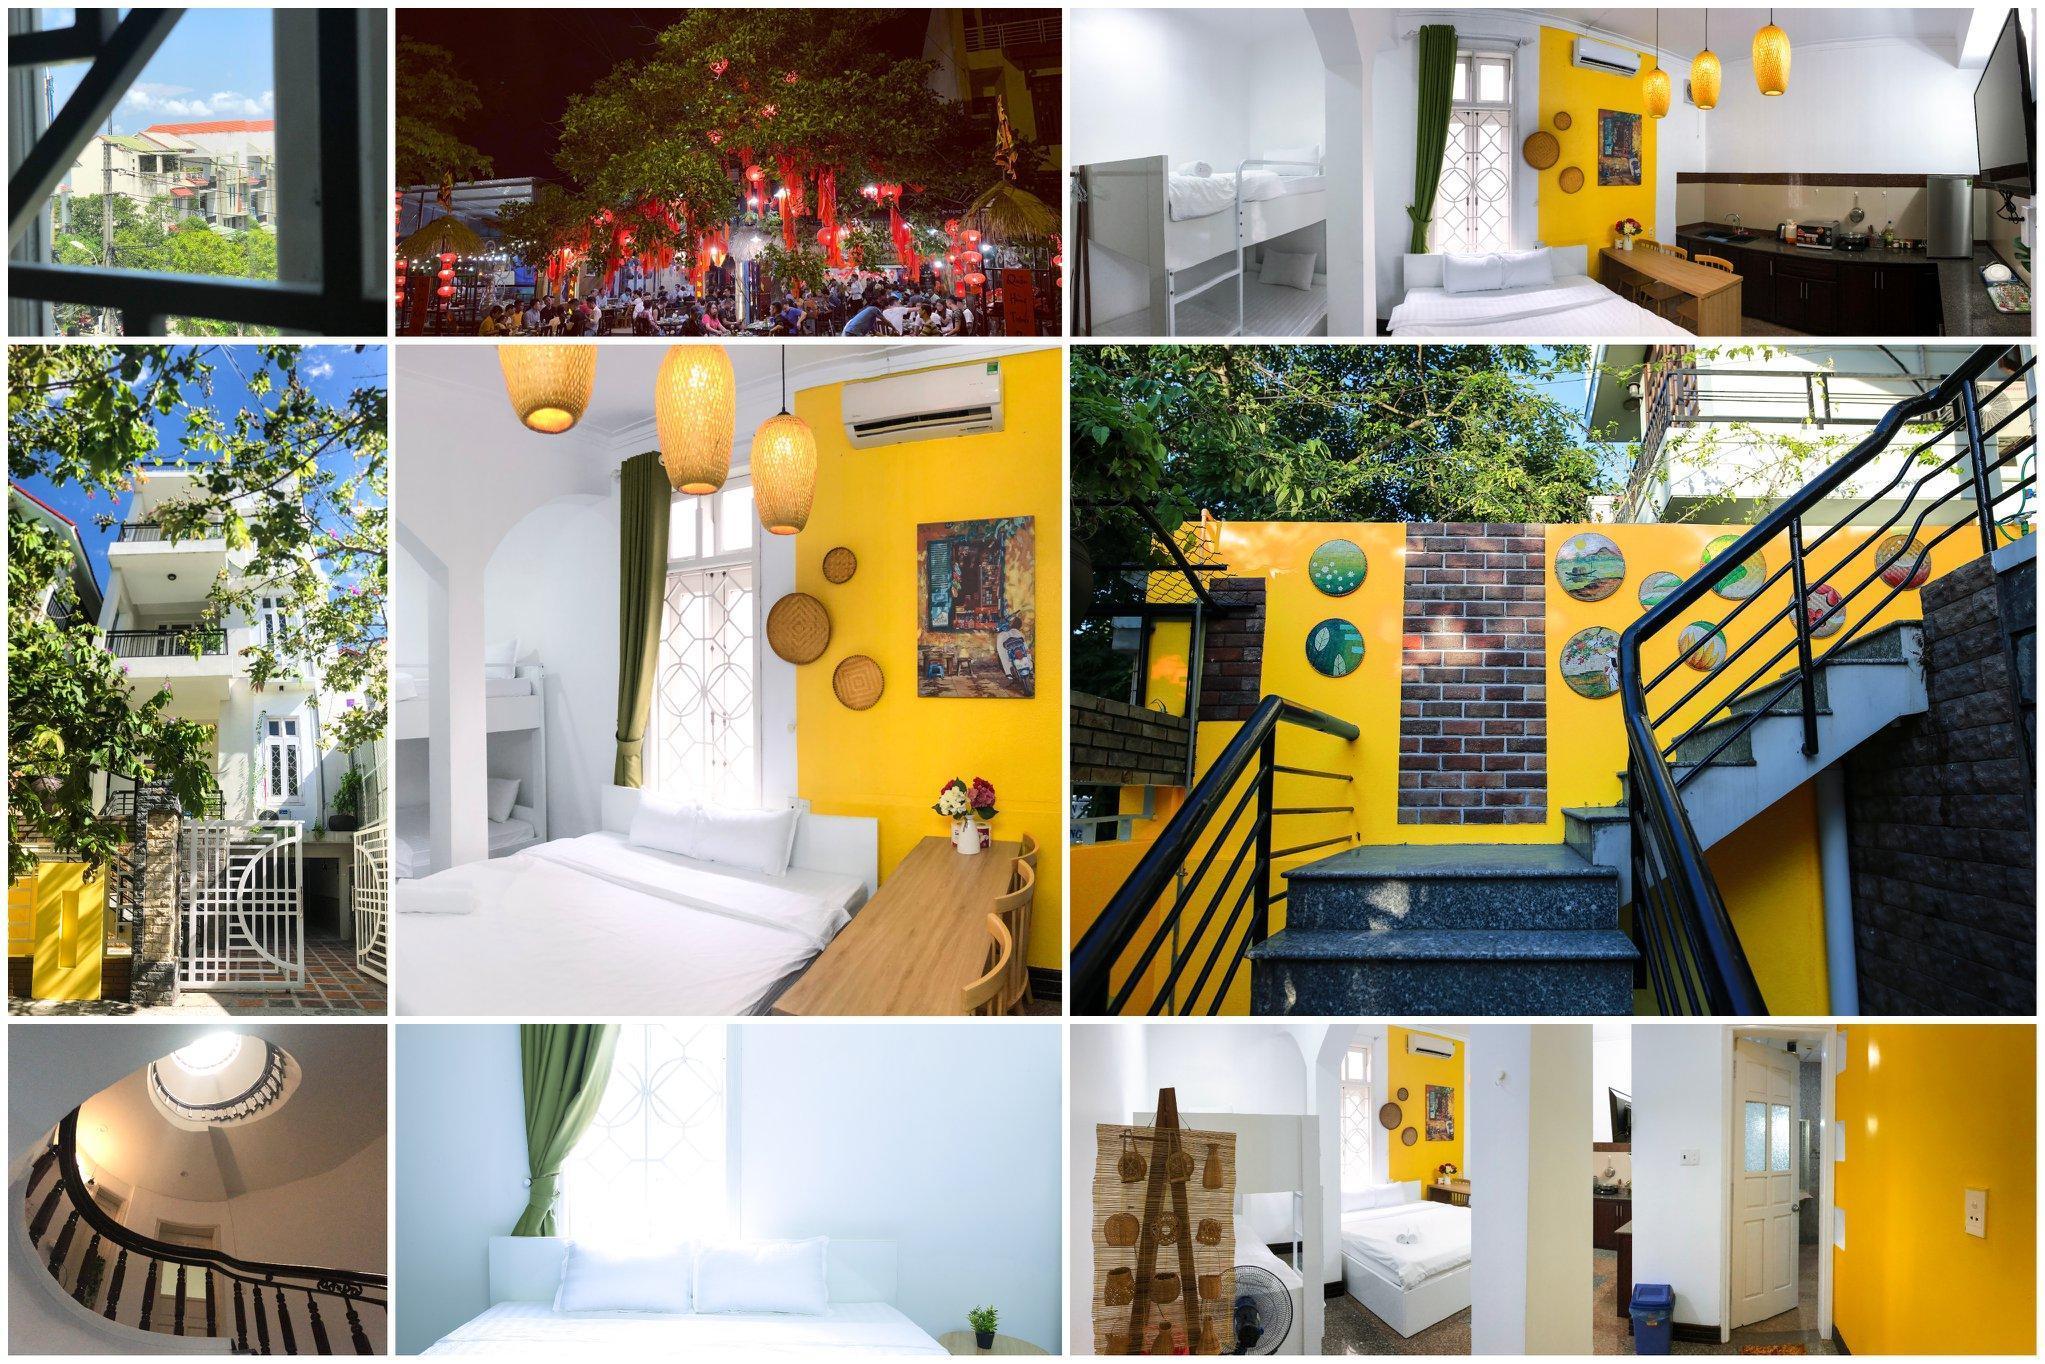 12 A Modern Studio In A Western Styled Villa 40m2